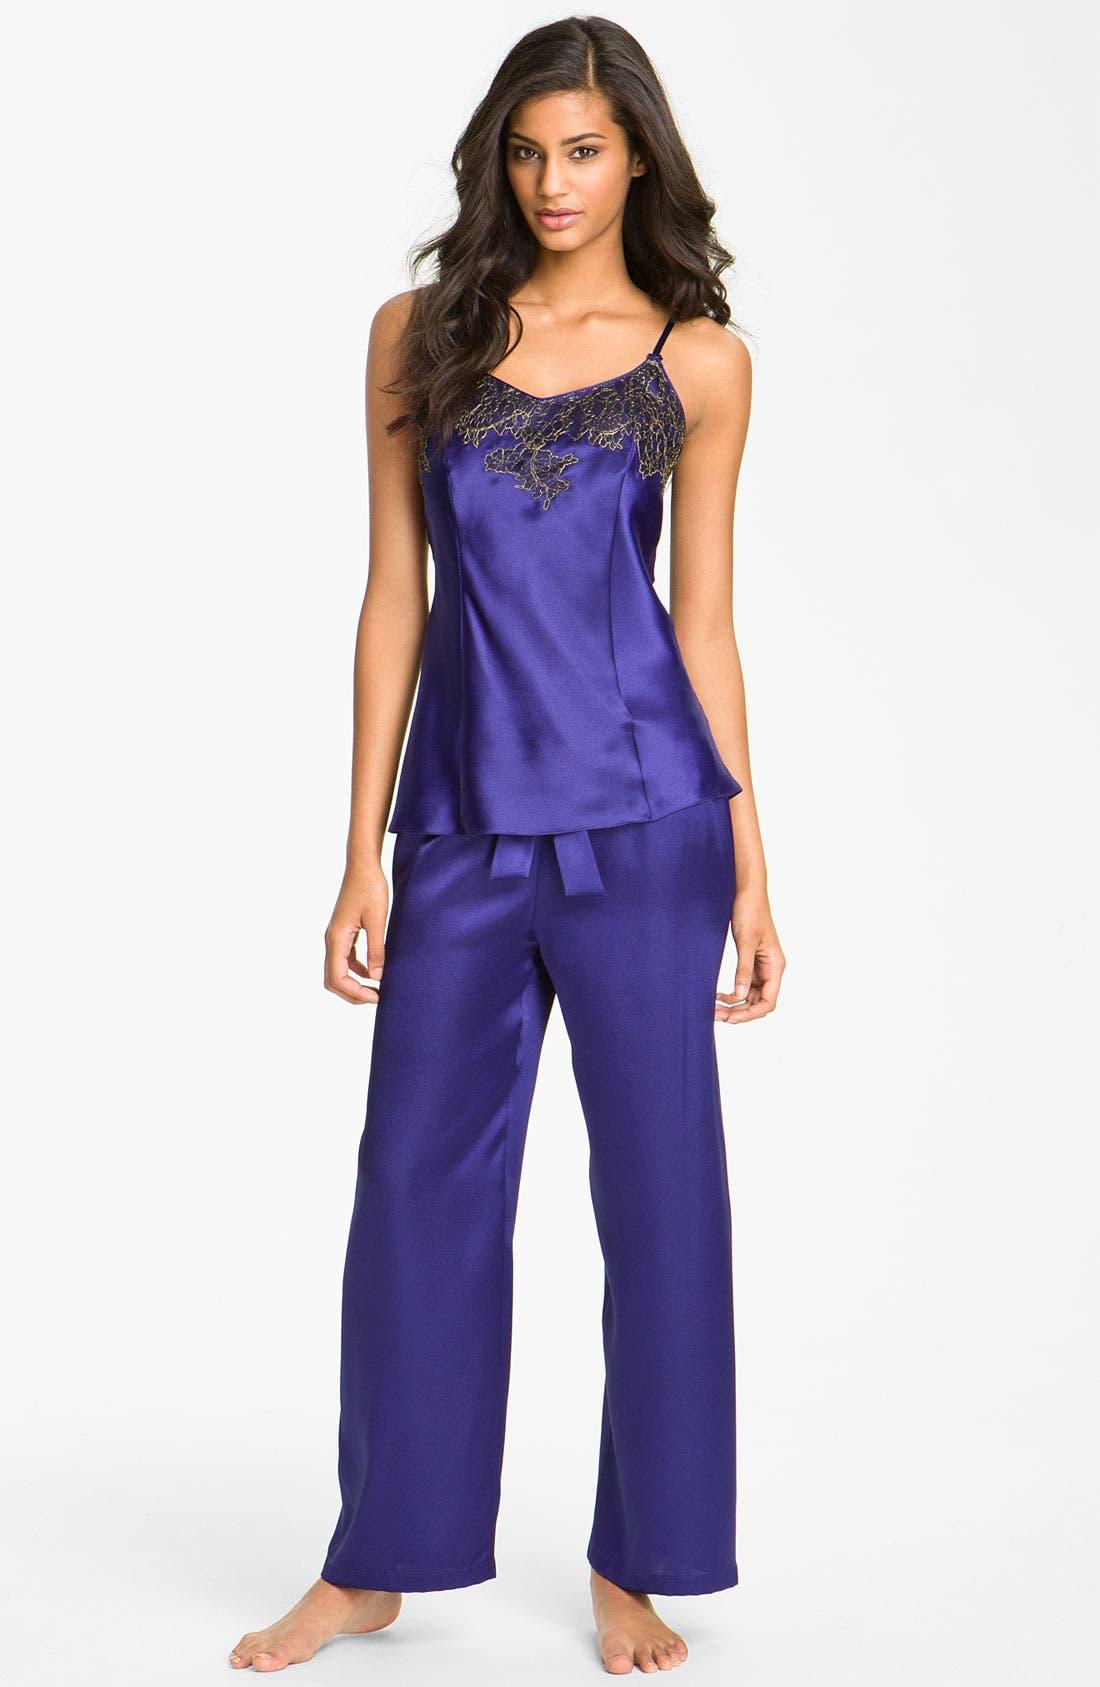 Main Image - Oscar de la Renta Sleepwear 'Twilight Lace' Pajamas